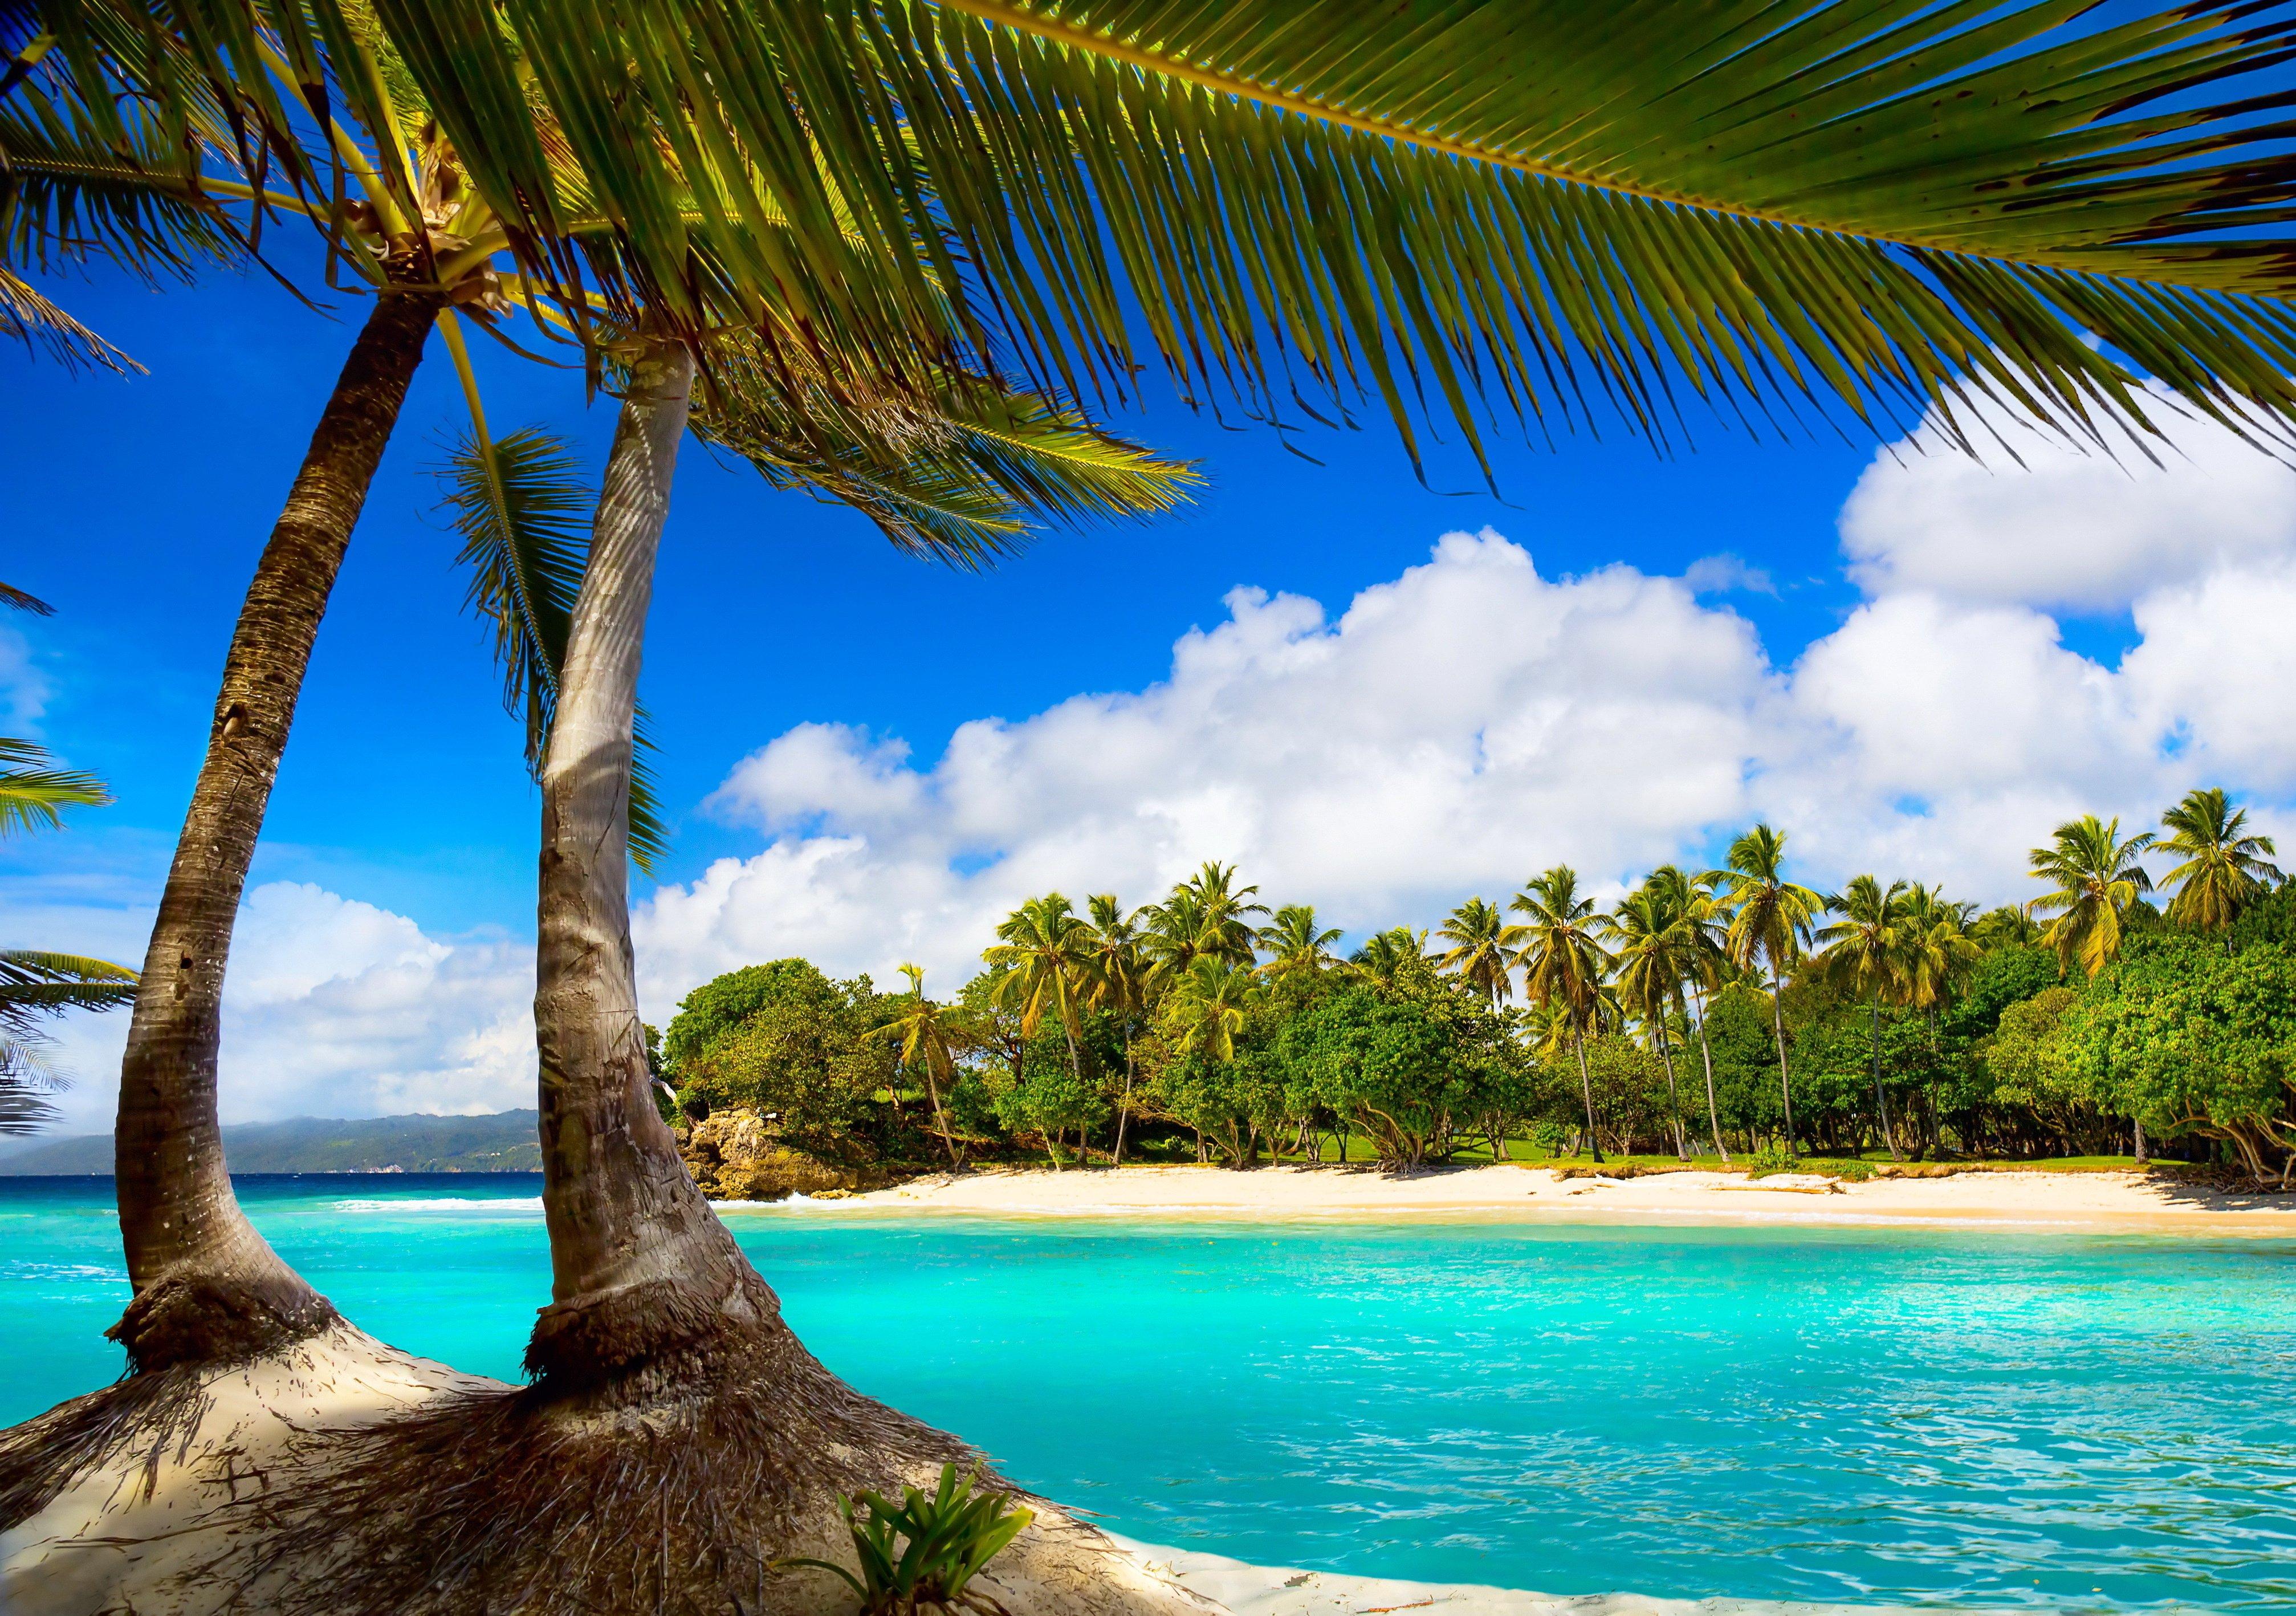 Free Photo Vacation Summer Beach To Desktop